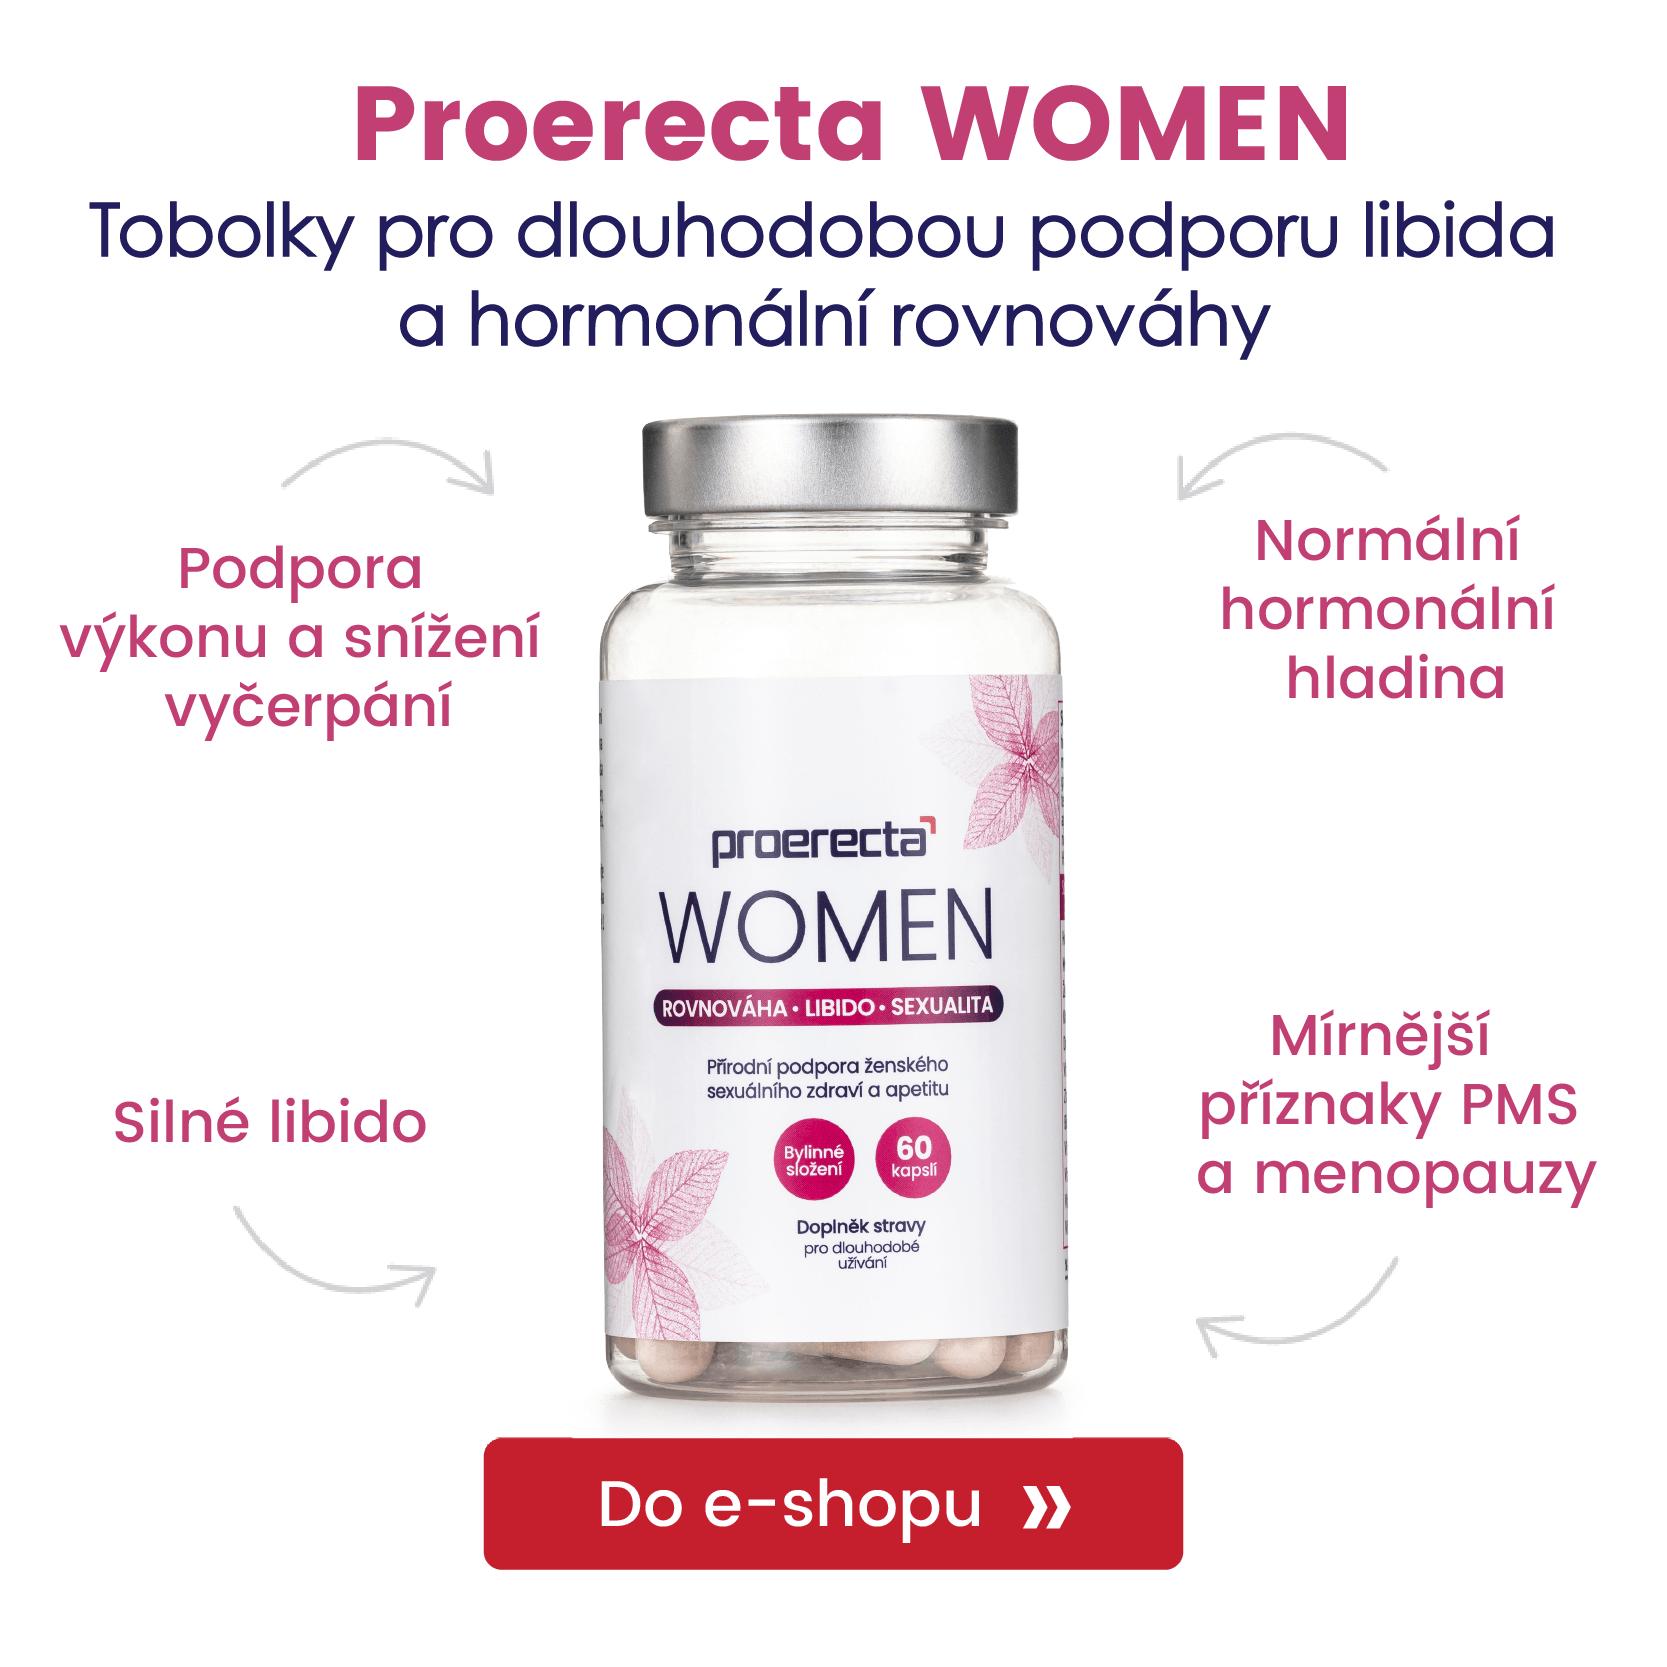 Proerecta WOMEN koupit